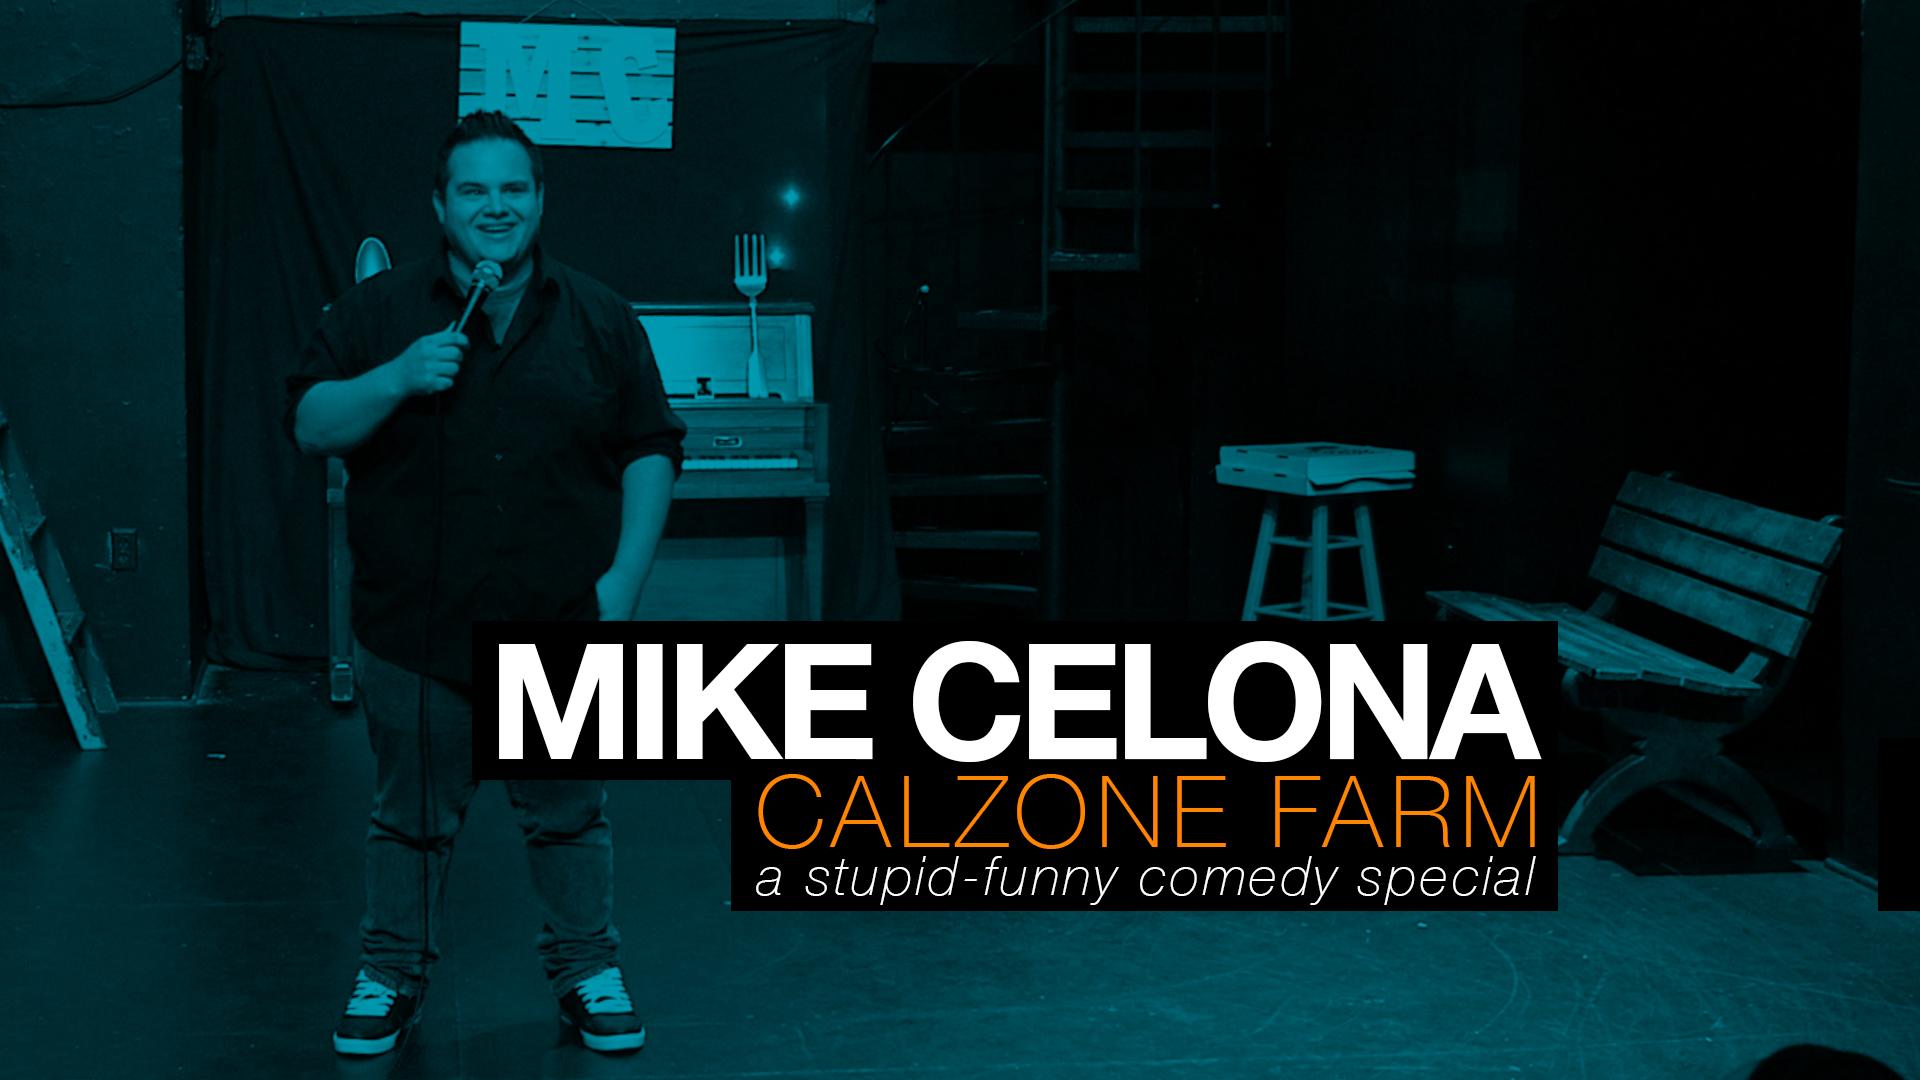 Mike Celona's Calzone Farm